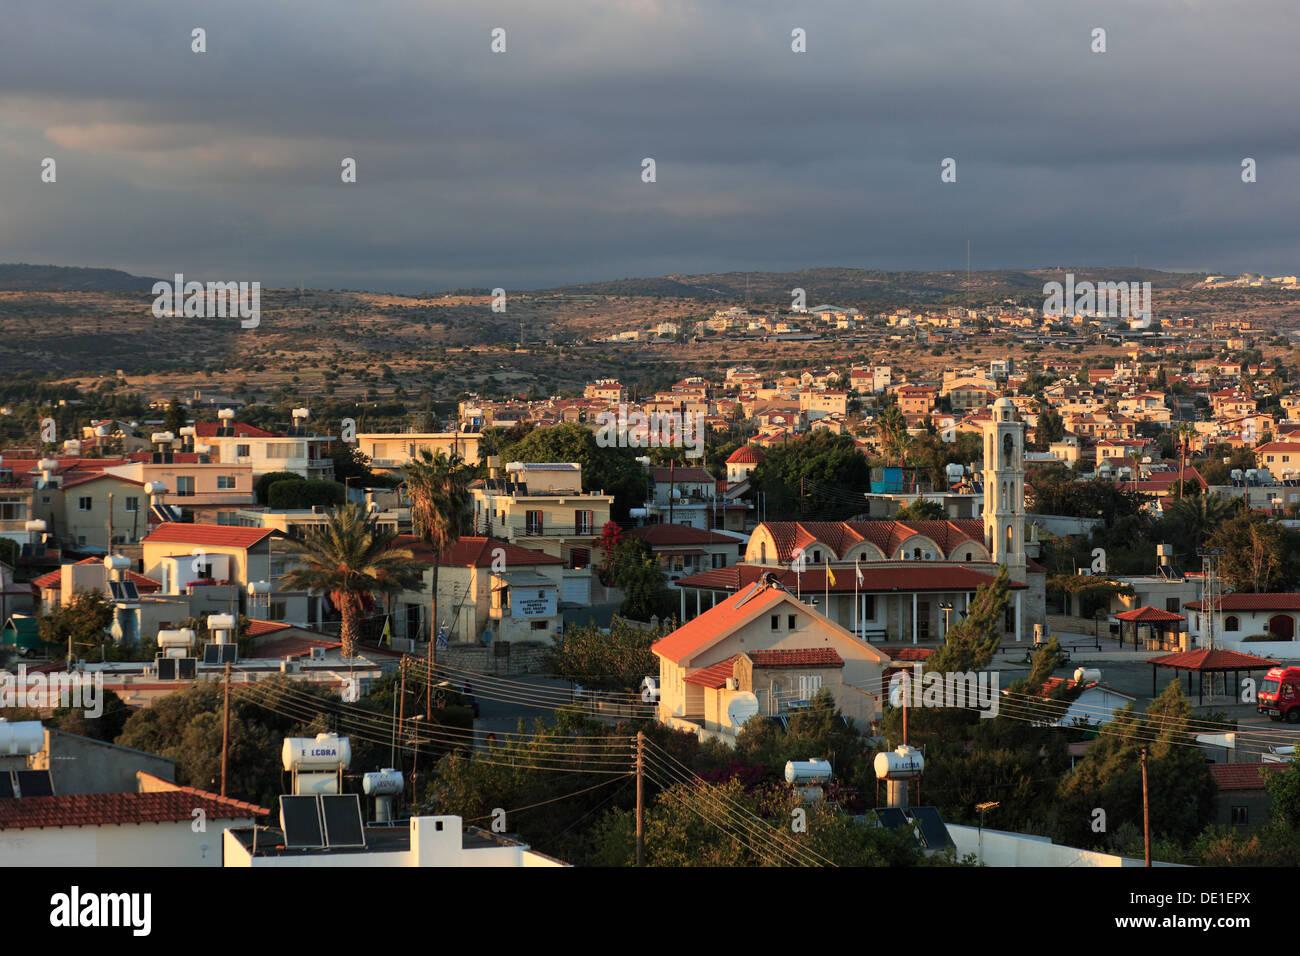 Cyprus, overlooking the town of Limassol, Lemesos, Limassol, - Stock Image